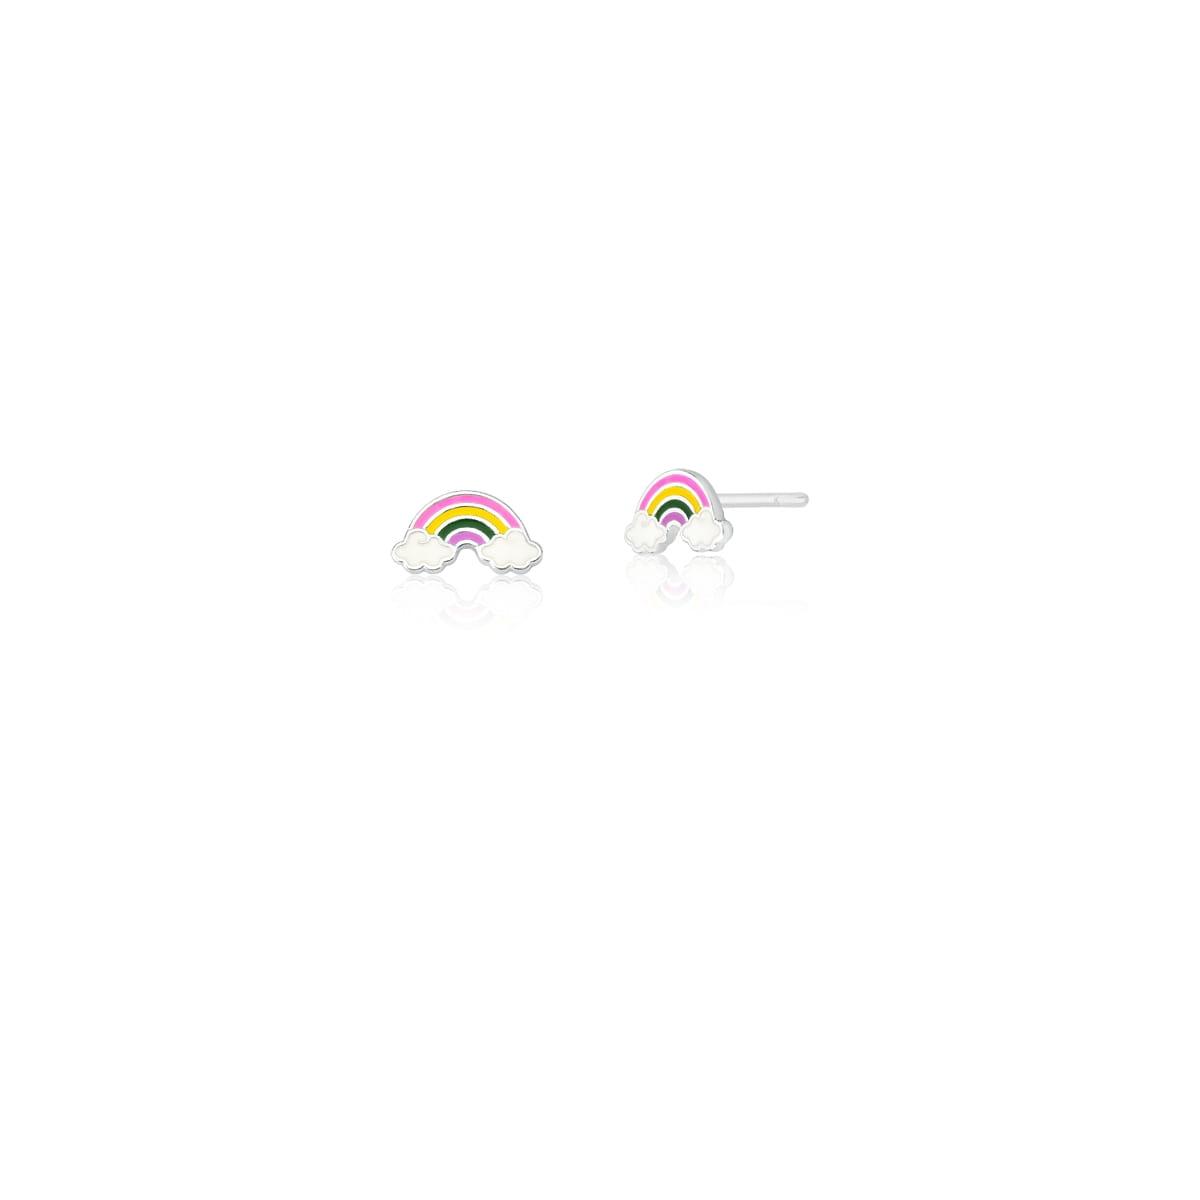 Brinco Kids de Arco-Íris Esmaltado Colorido Prata Lisa